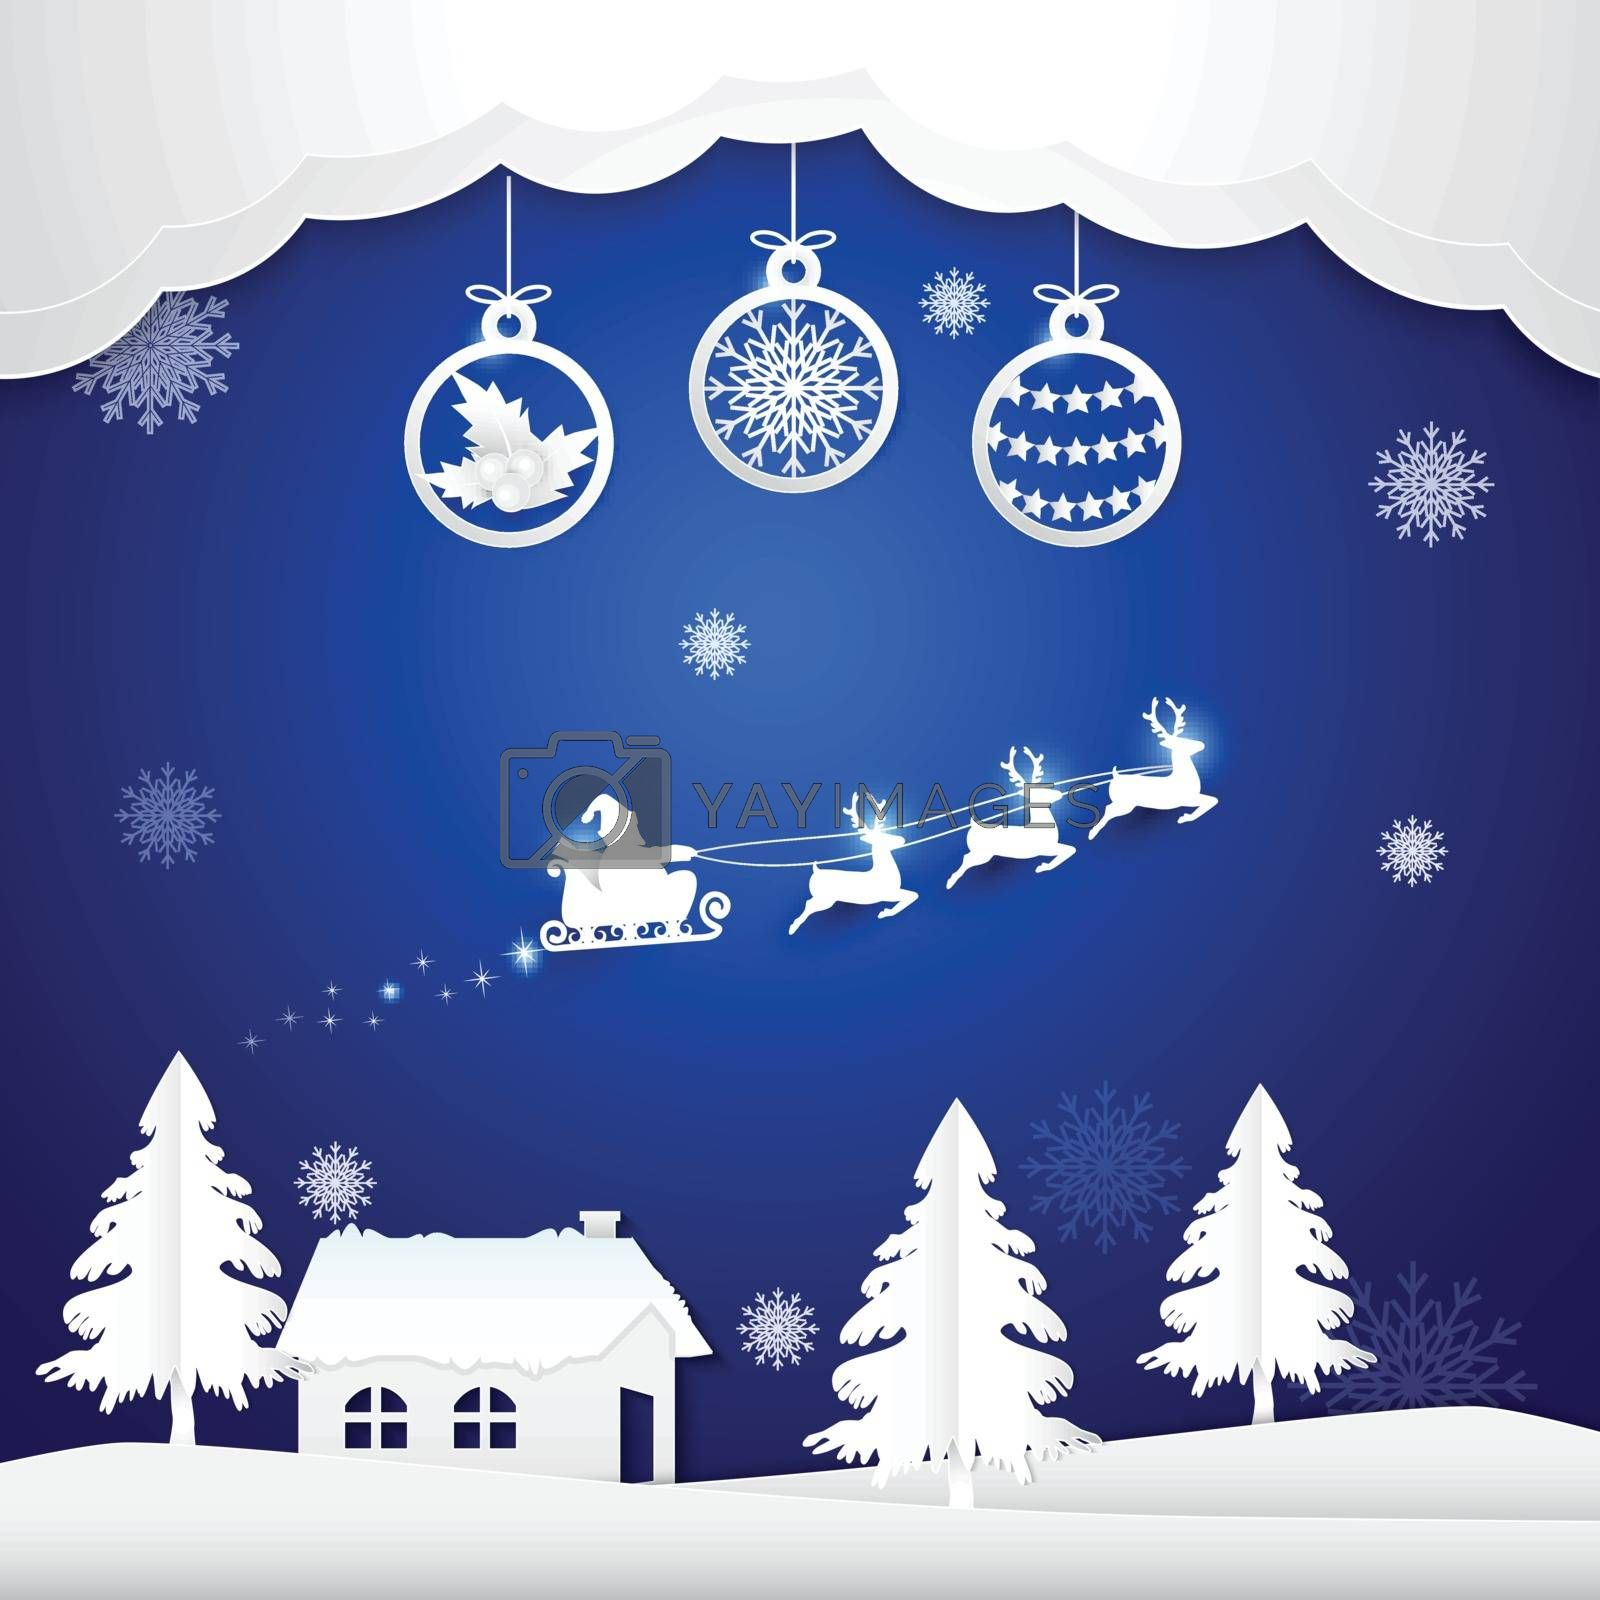 Winter holiday Santa and ball decoration Christmas season paper art, paper cut style illustration.